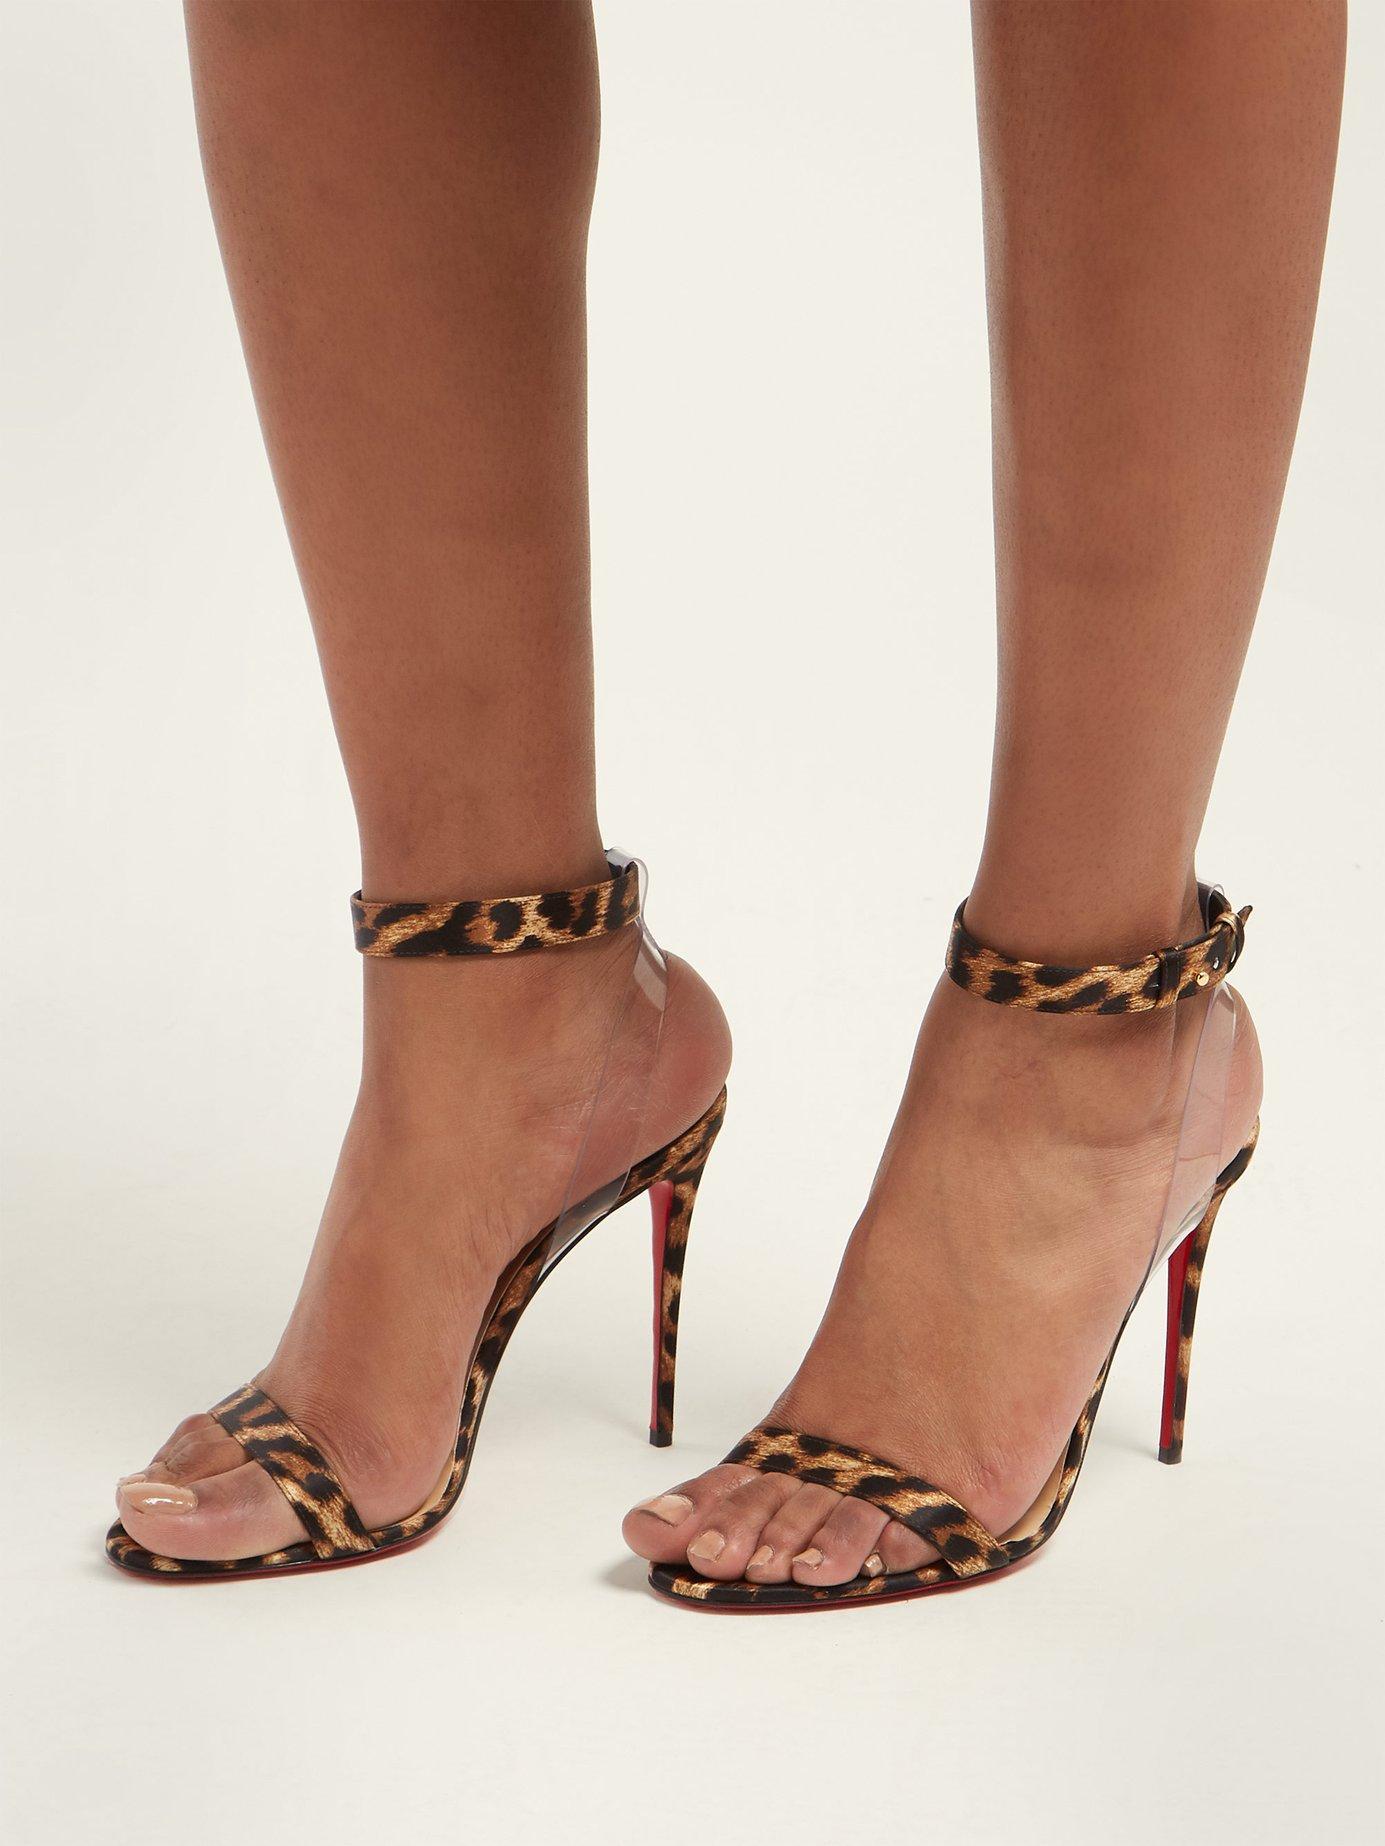 san francisco 552b6 30778 Women's Brown Jonatina 100 Leopard Print Satin Sandals